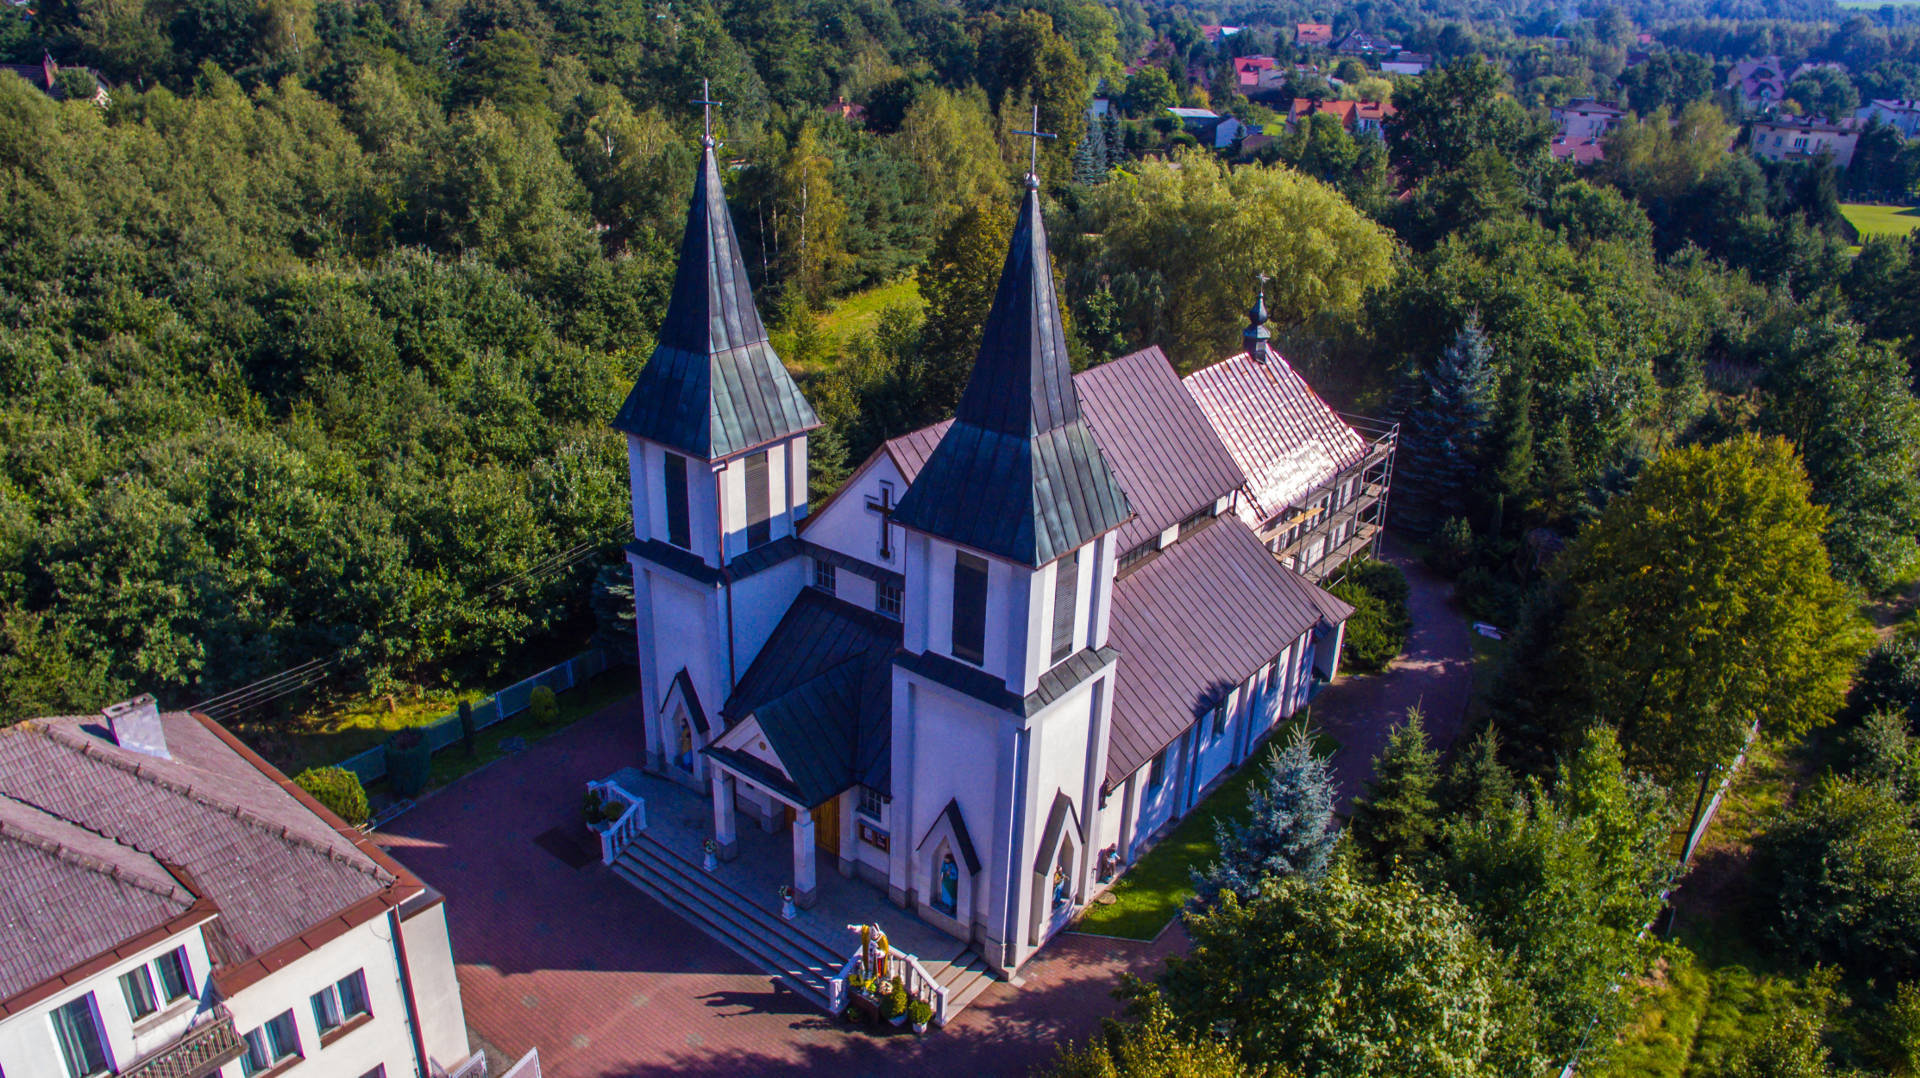 Borek Szlachecki, Parafia Zwiastowania Pańskiego